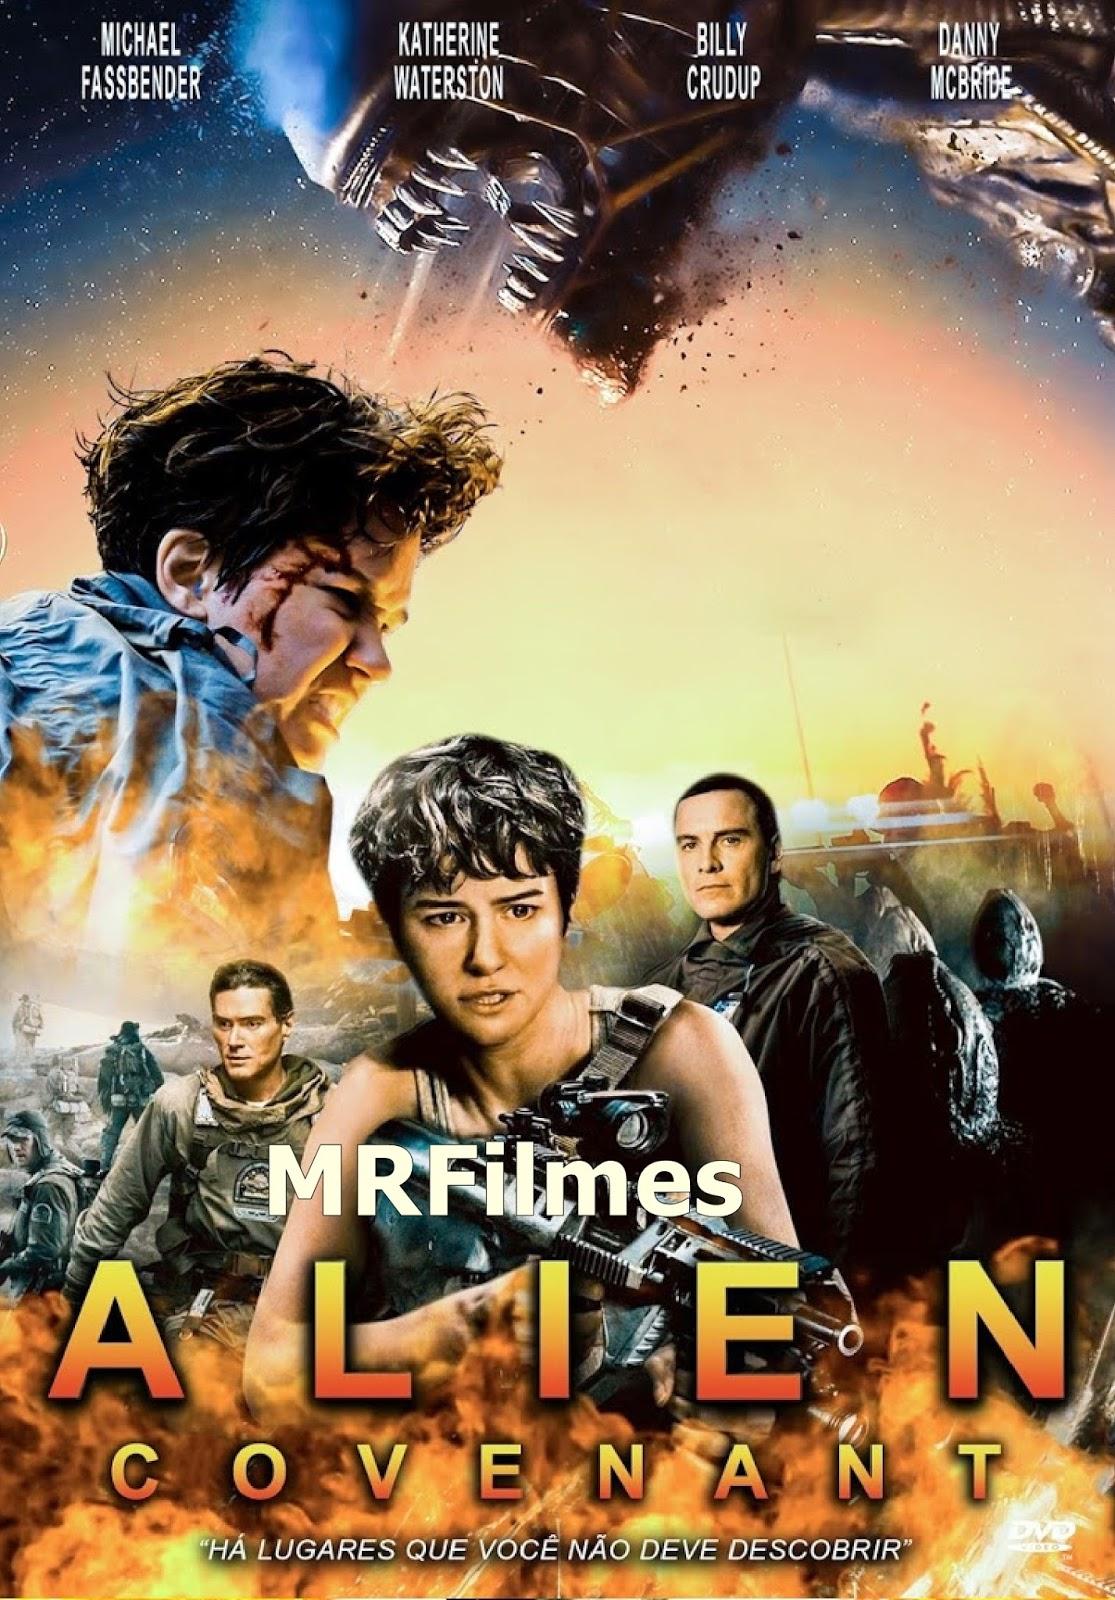 TURMA BAIXAR AVI DVD PAGODE 2012 DO